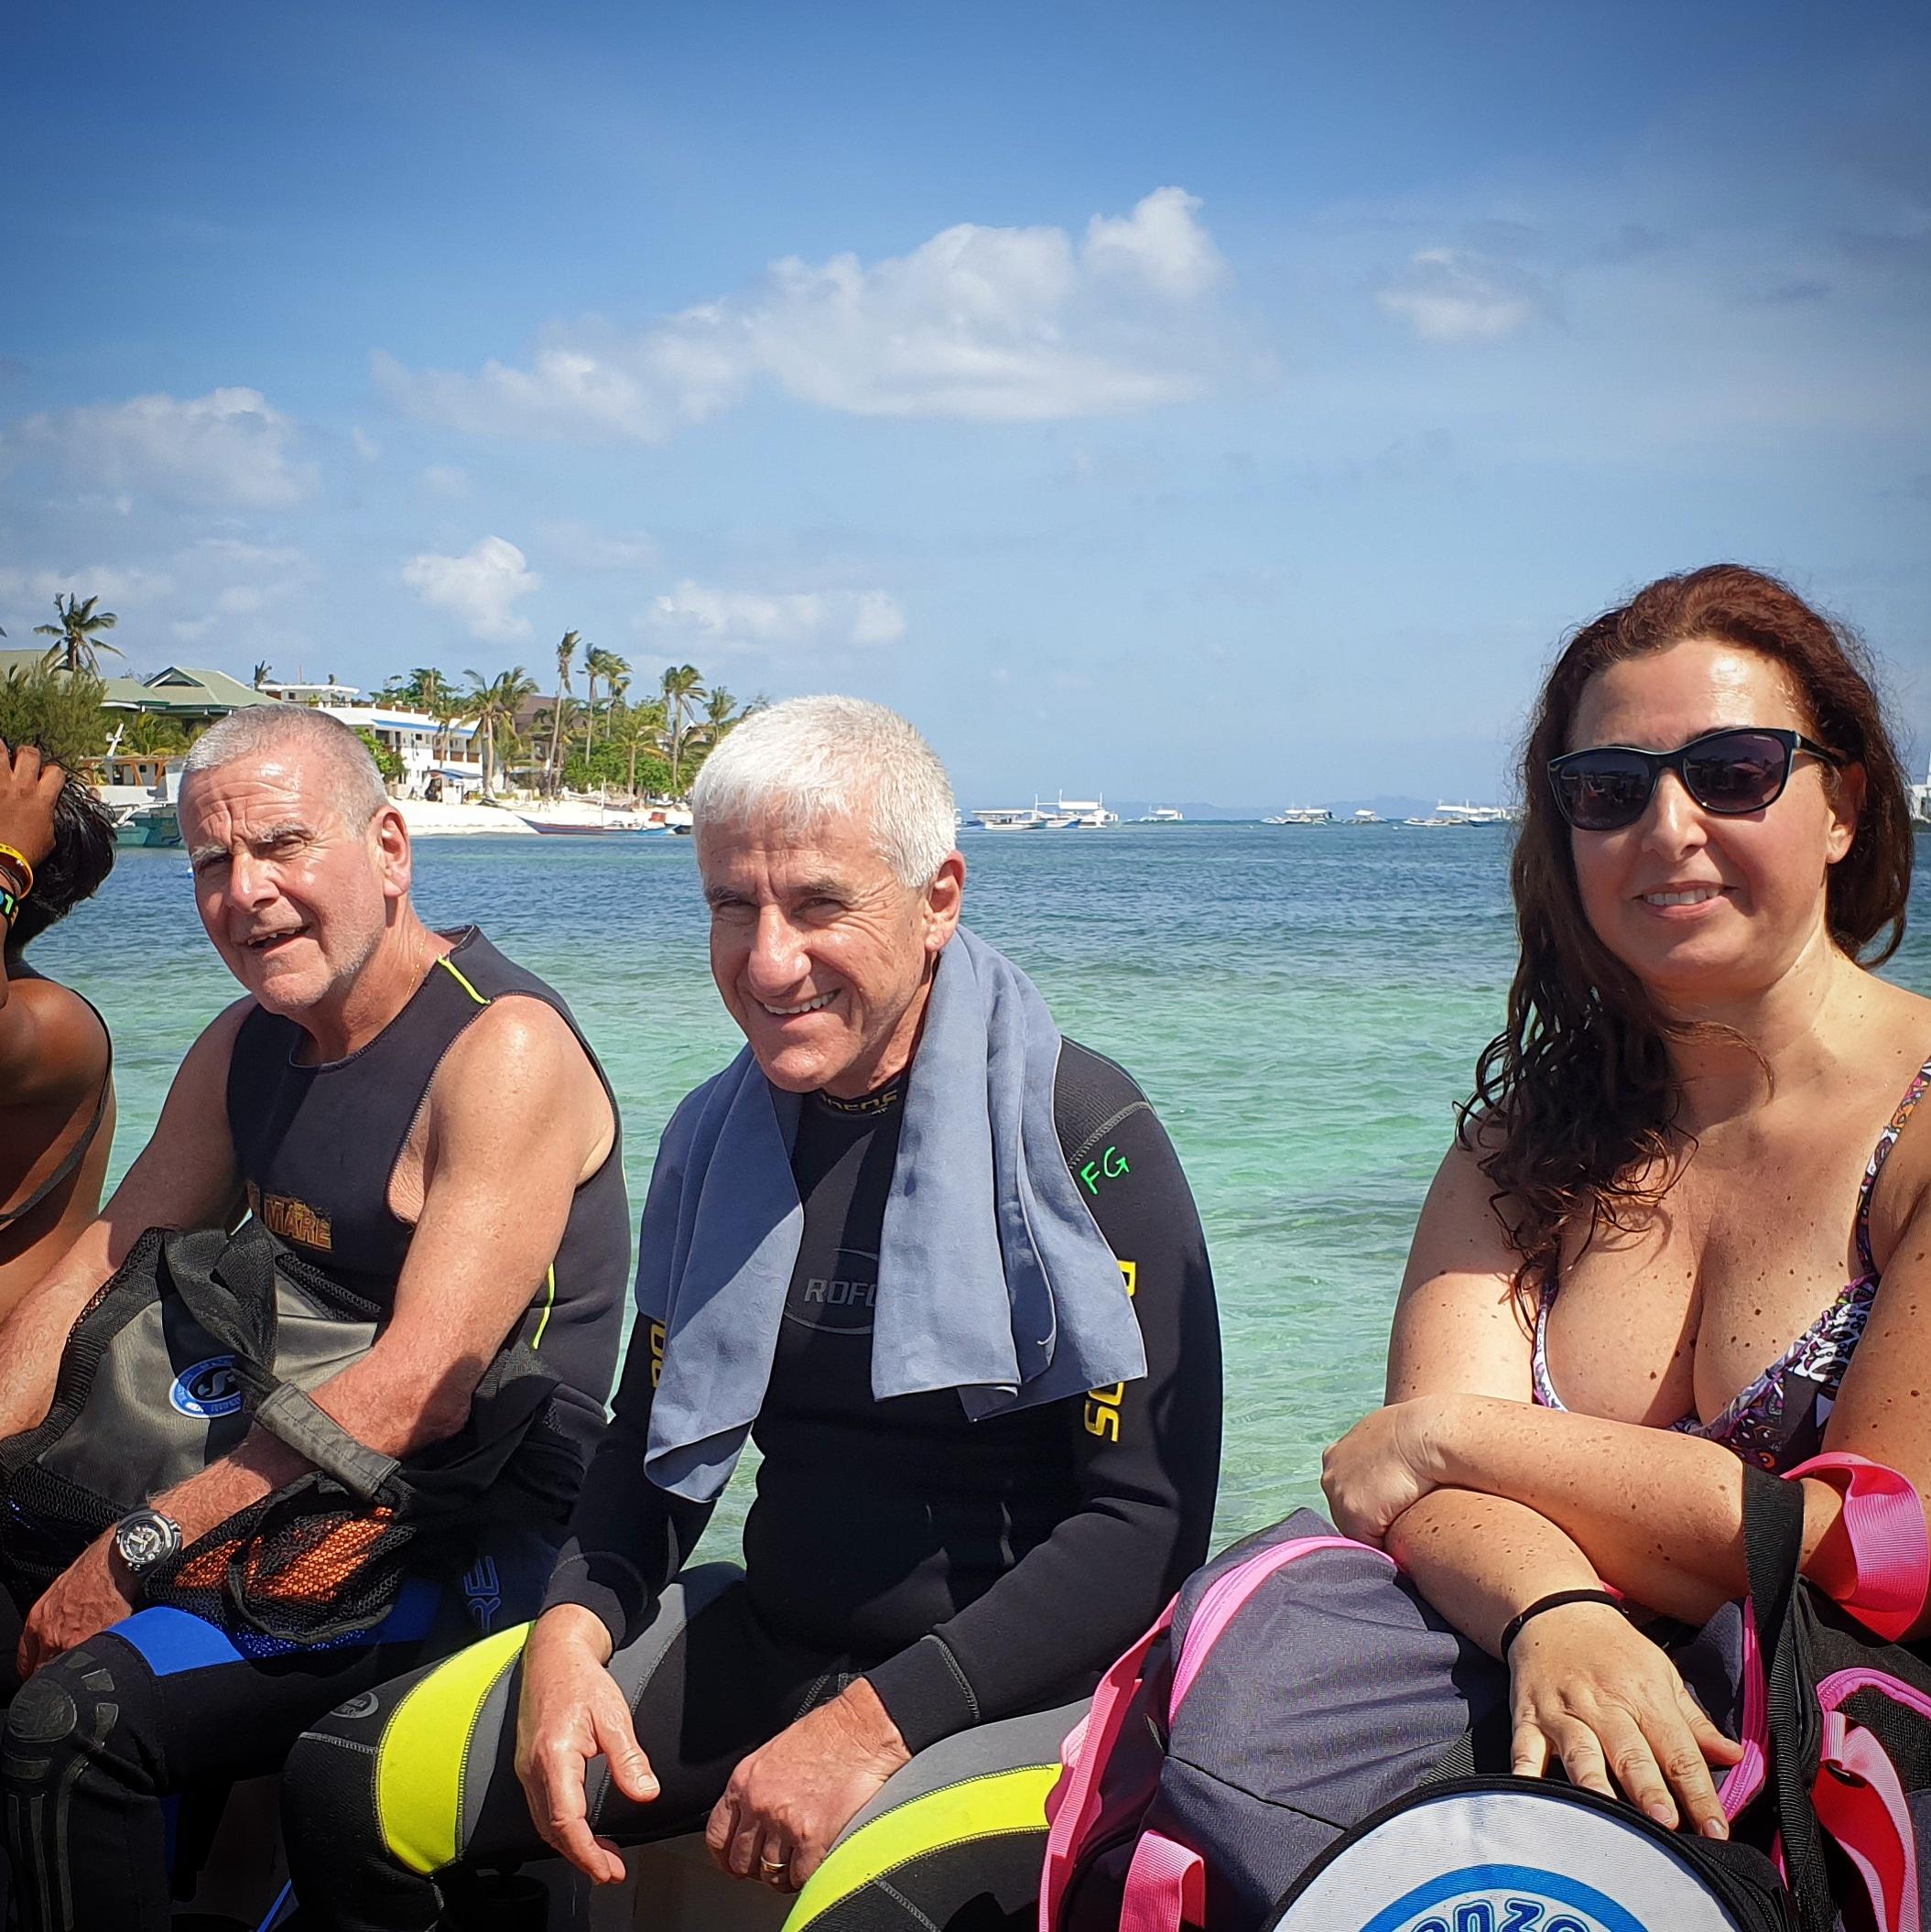 Isola di Malapasqua, Olgiata Diving Febbraio 2020, People 9